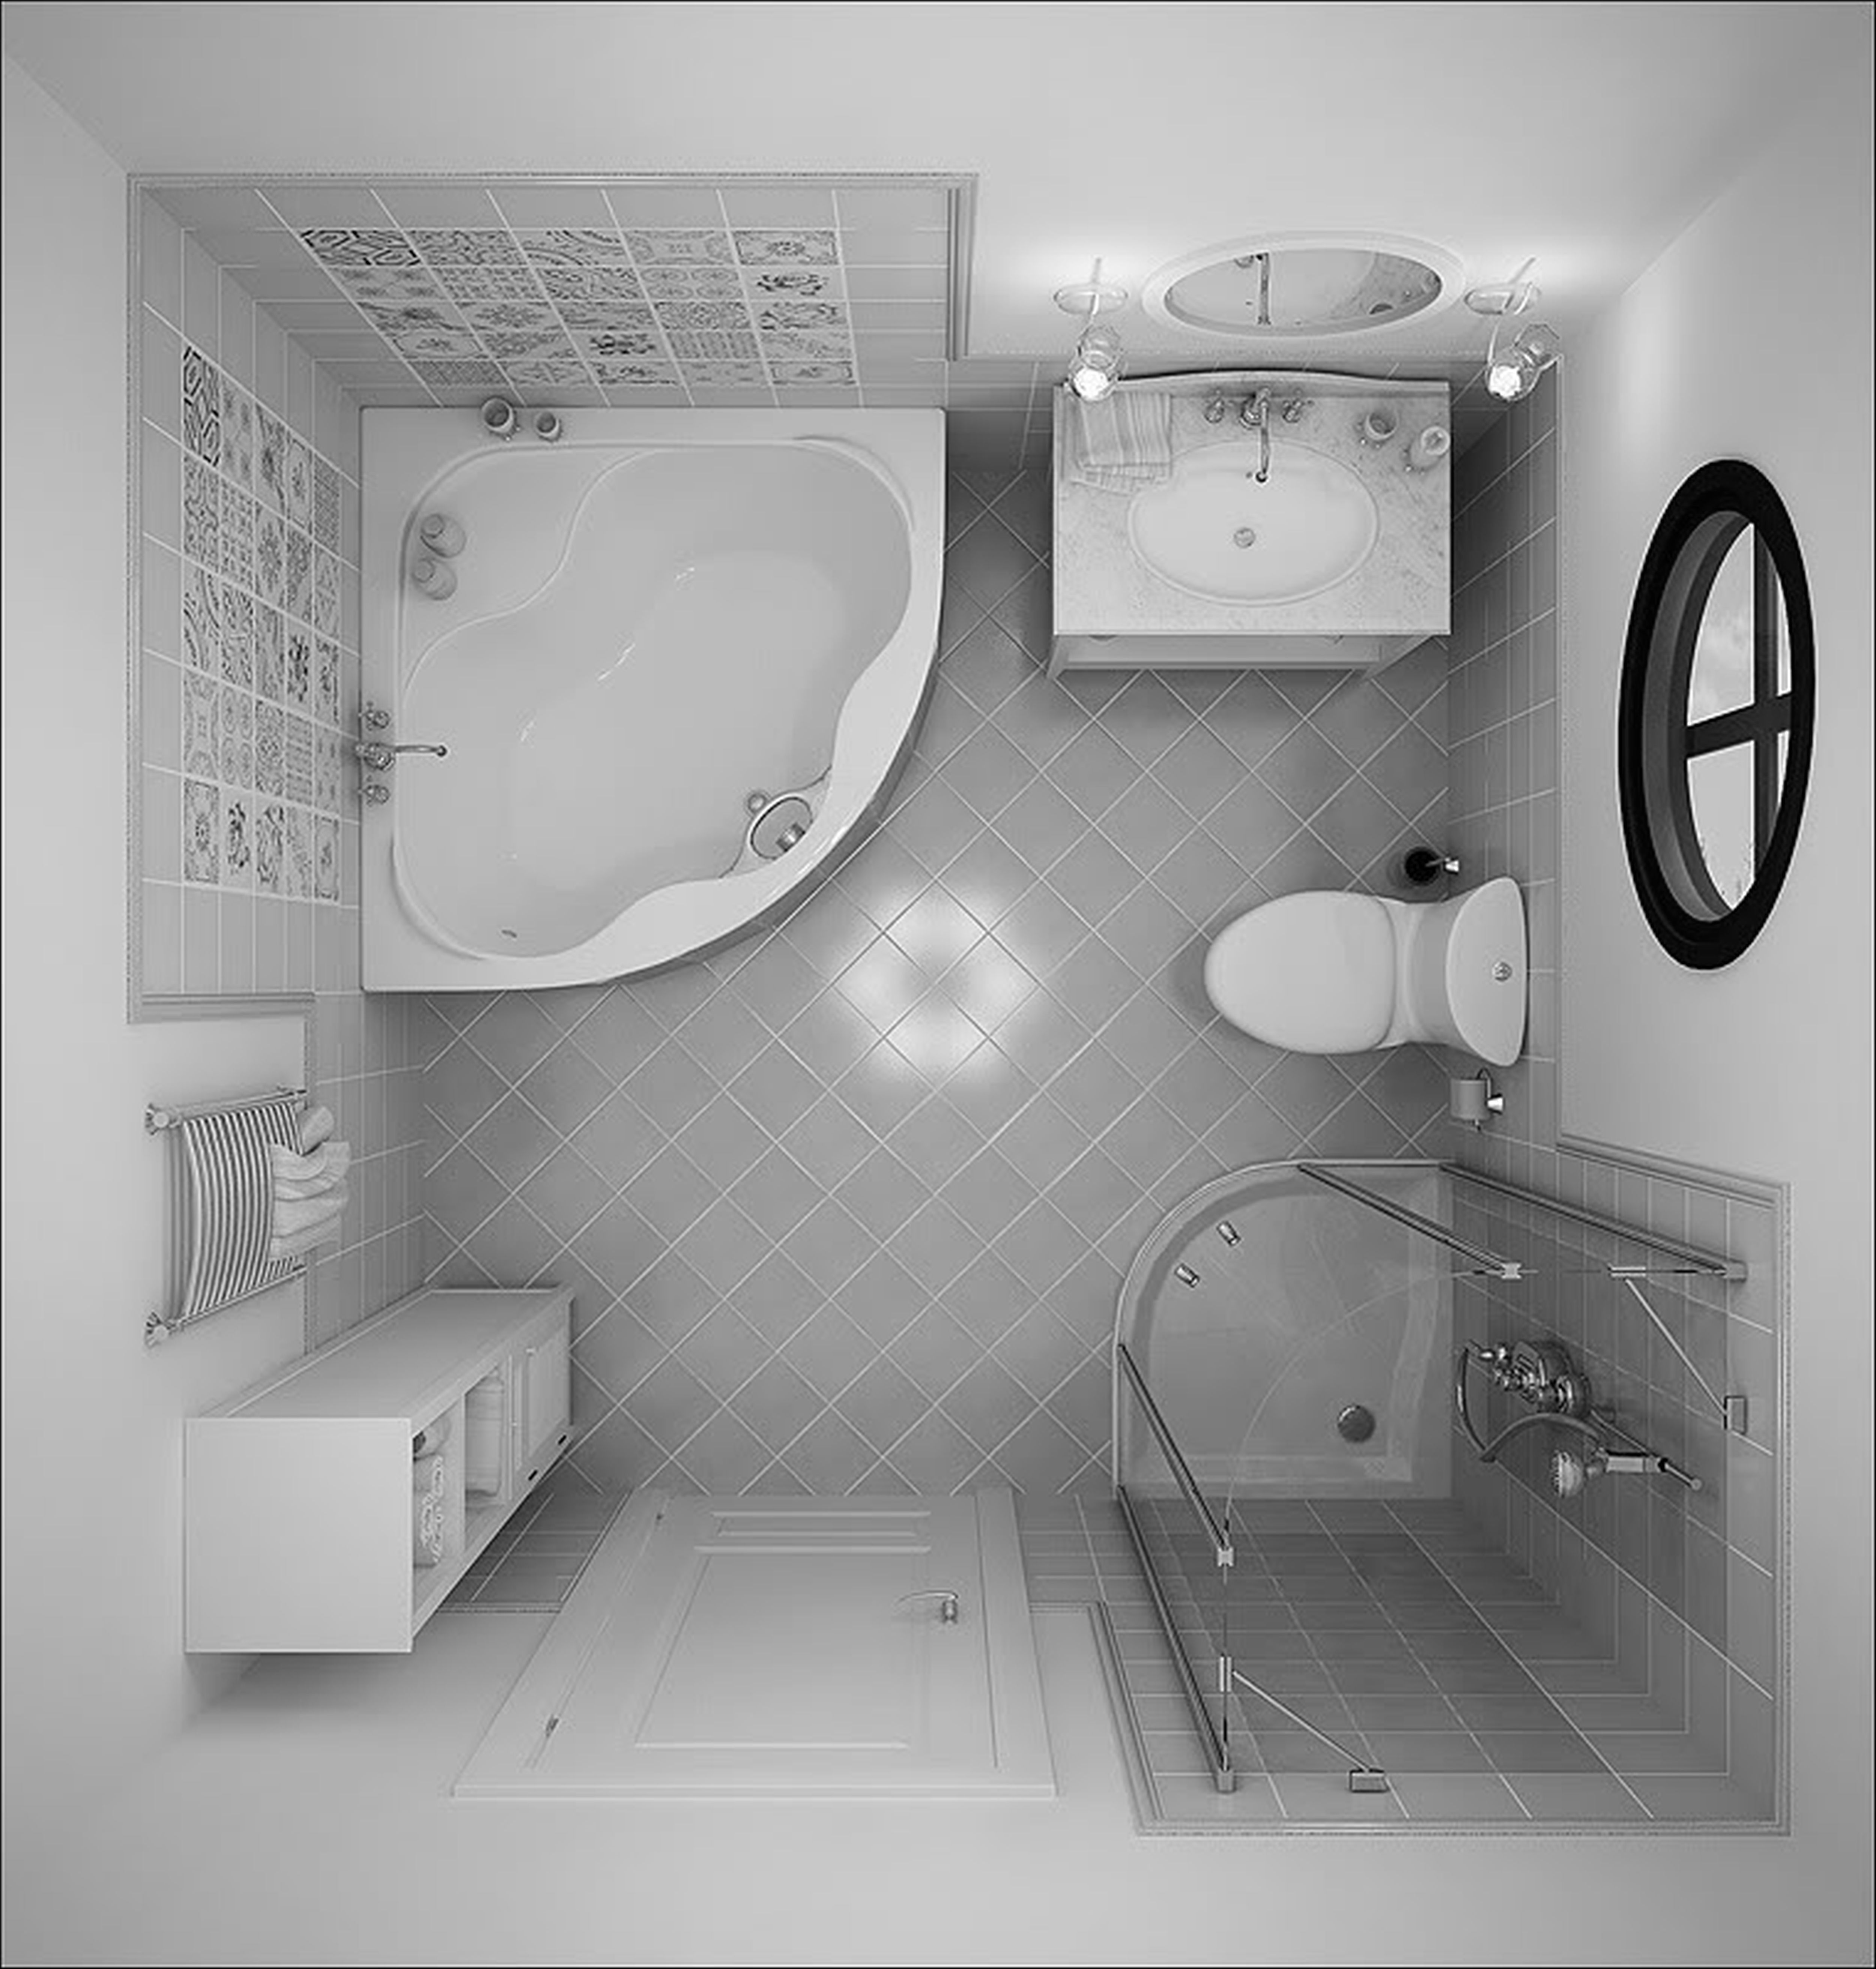 The Exact Same Way Bathroom Curtains Also Offer A Classy Appearance To Our Bath Space A Wall Hun Small Bathroom With Tub Bathroom Floor Plans Bathroom Layout Simple bathroom size tub